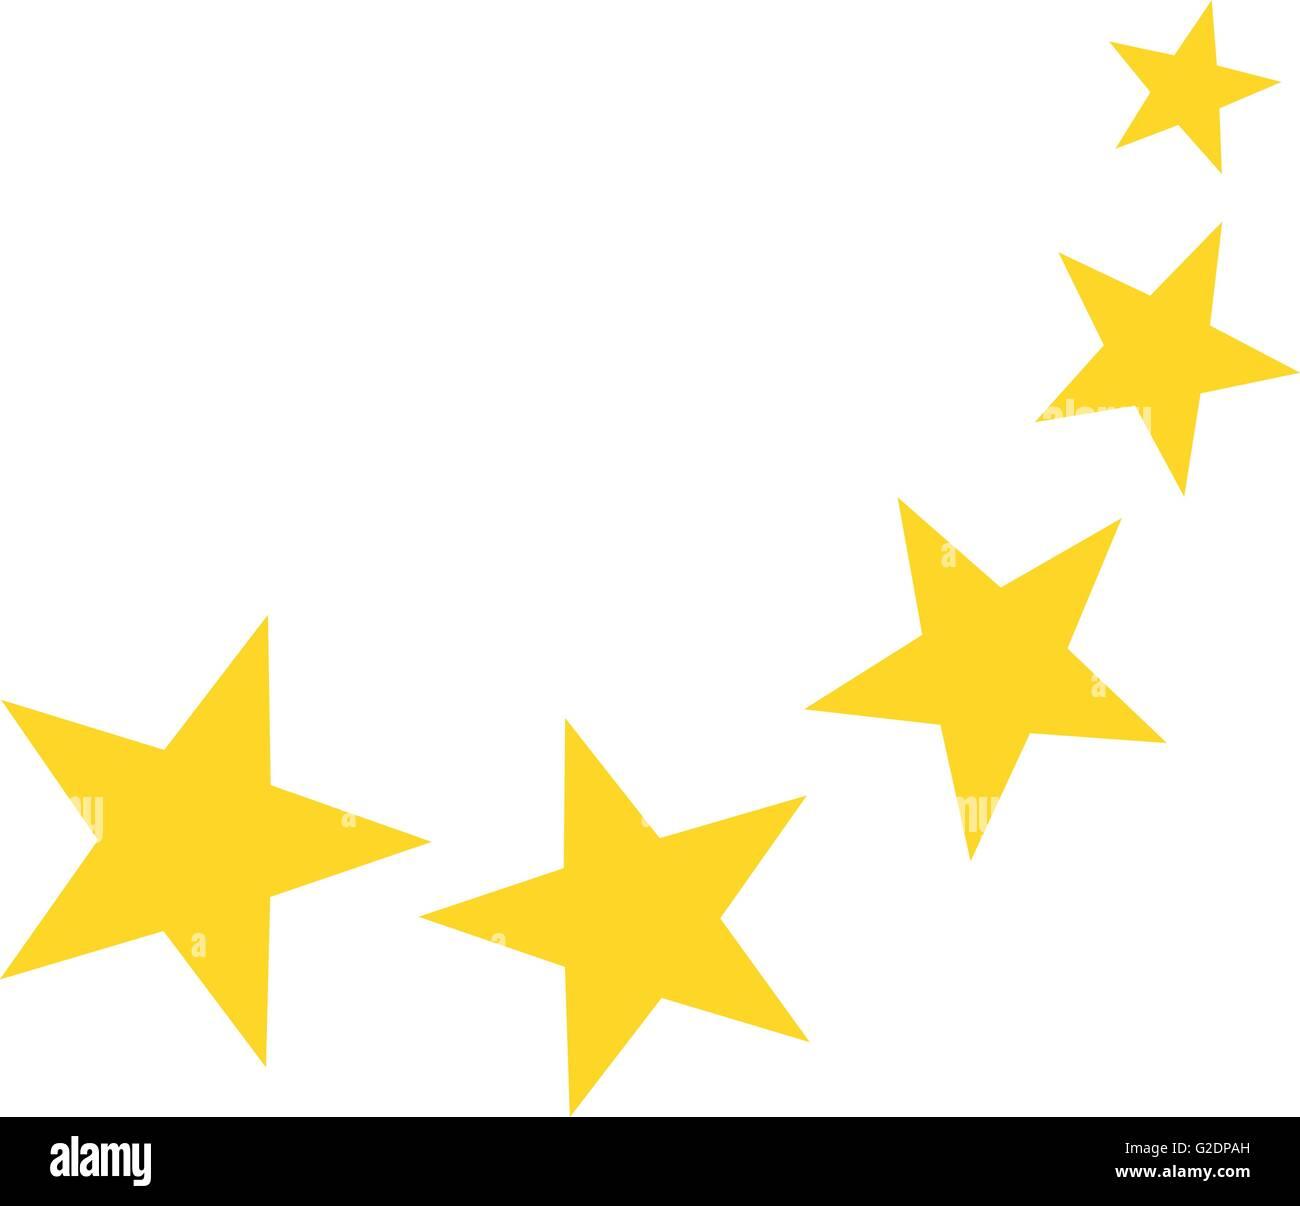 Falling yellow stars Stock Vector